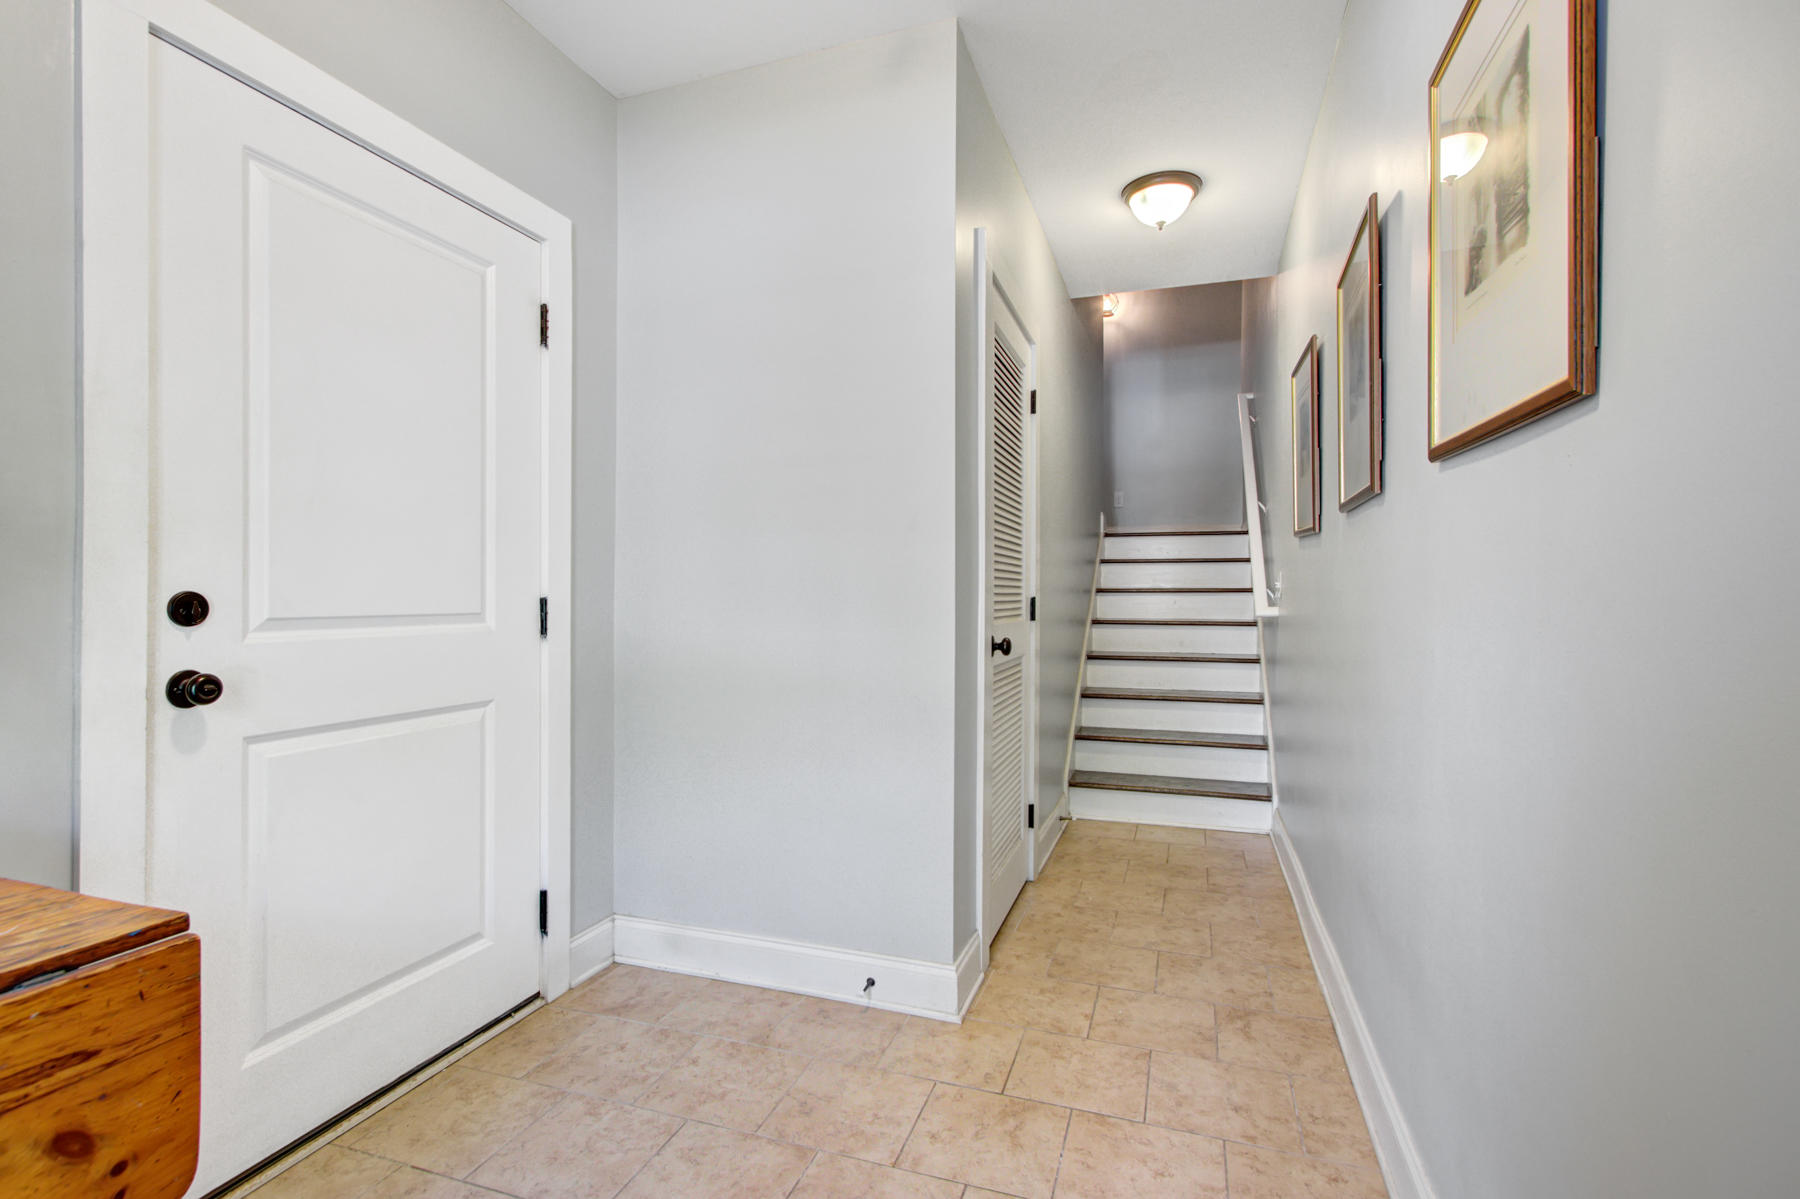 Etiwan Pointe Homes For Sale - 254 Slipper Shell, Mount Pleasant, SC - 44